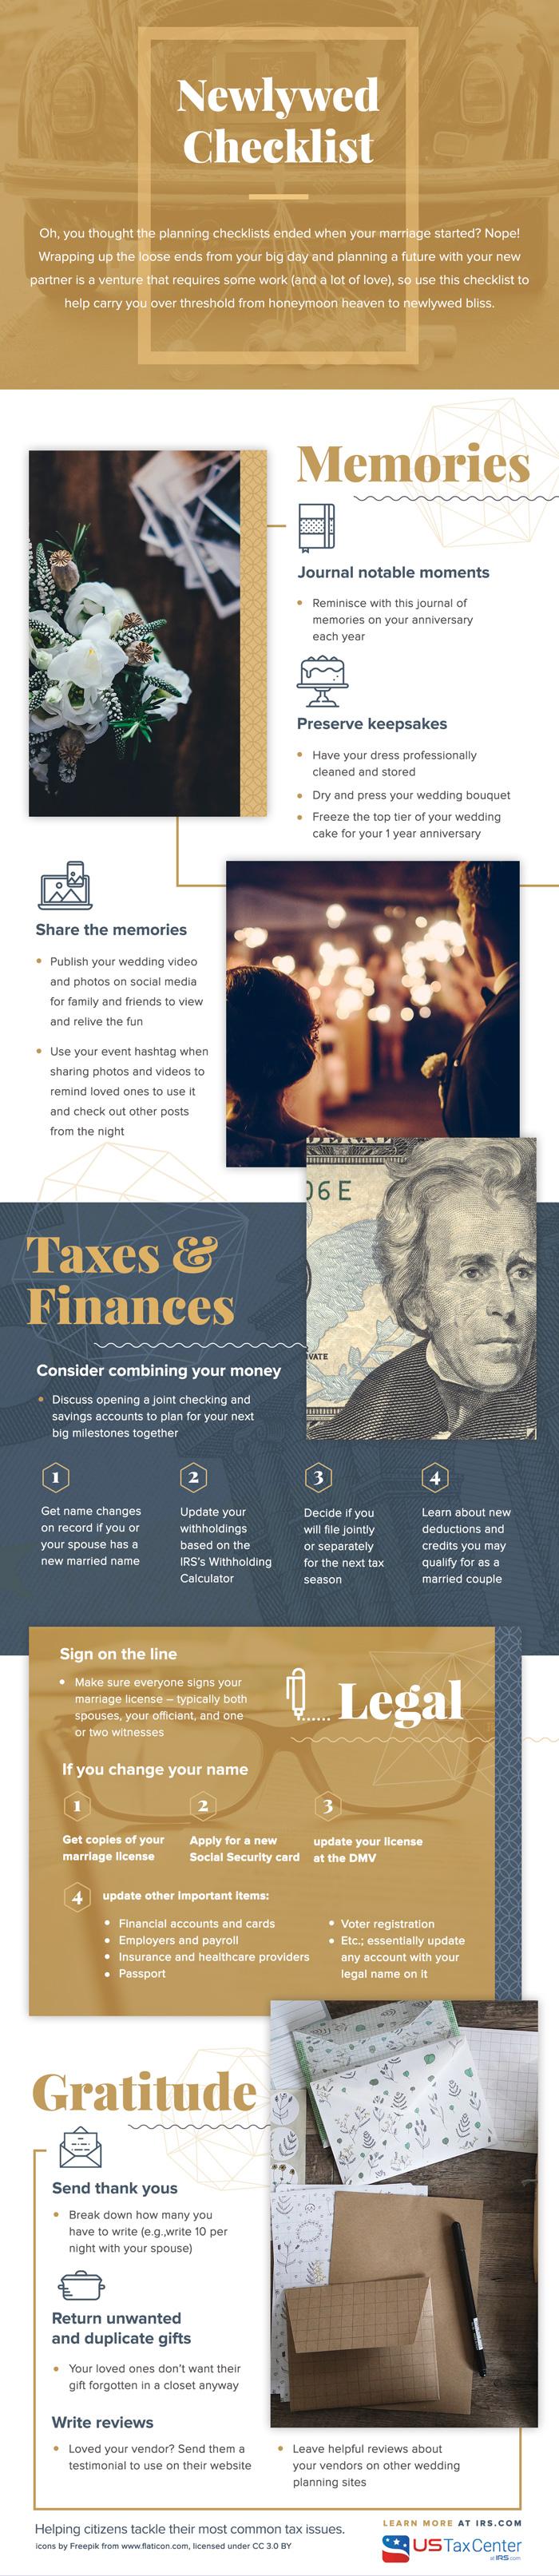 Newlywed Checklist from IRS.gov